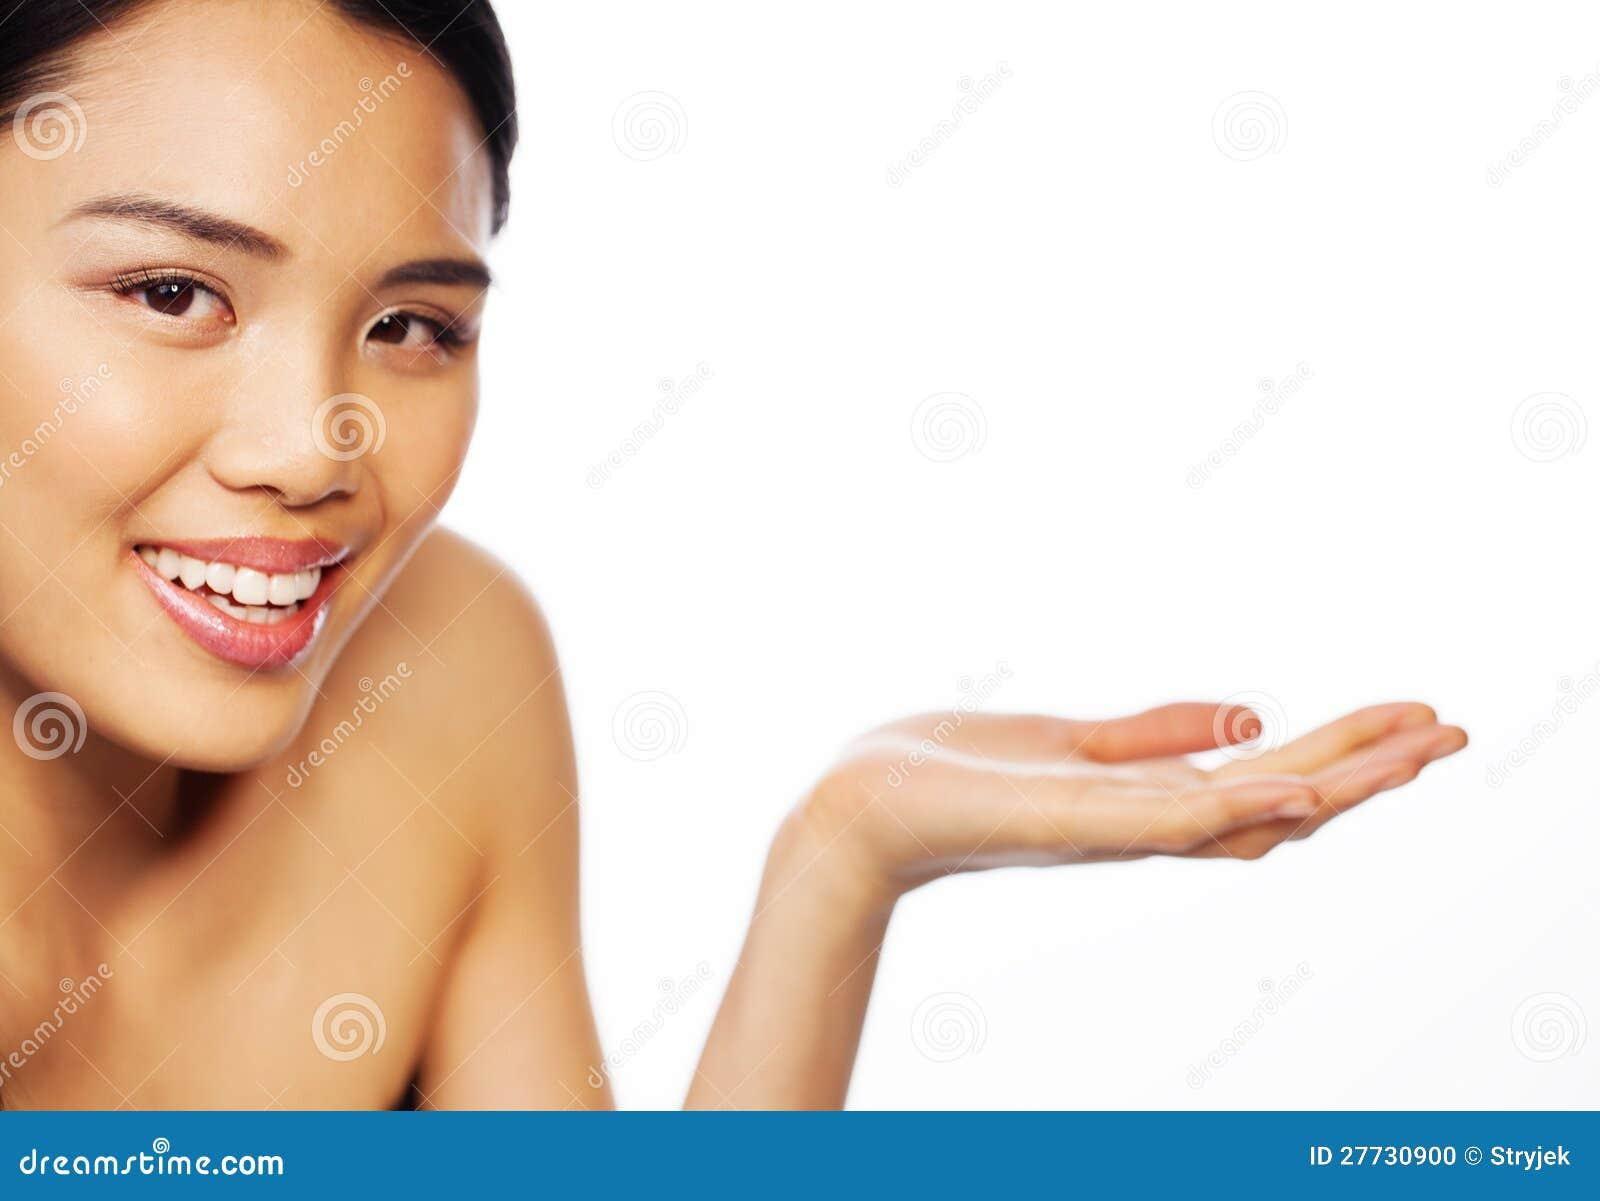 masturbation to get soerm